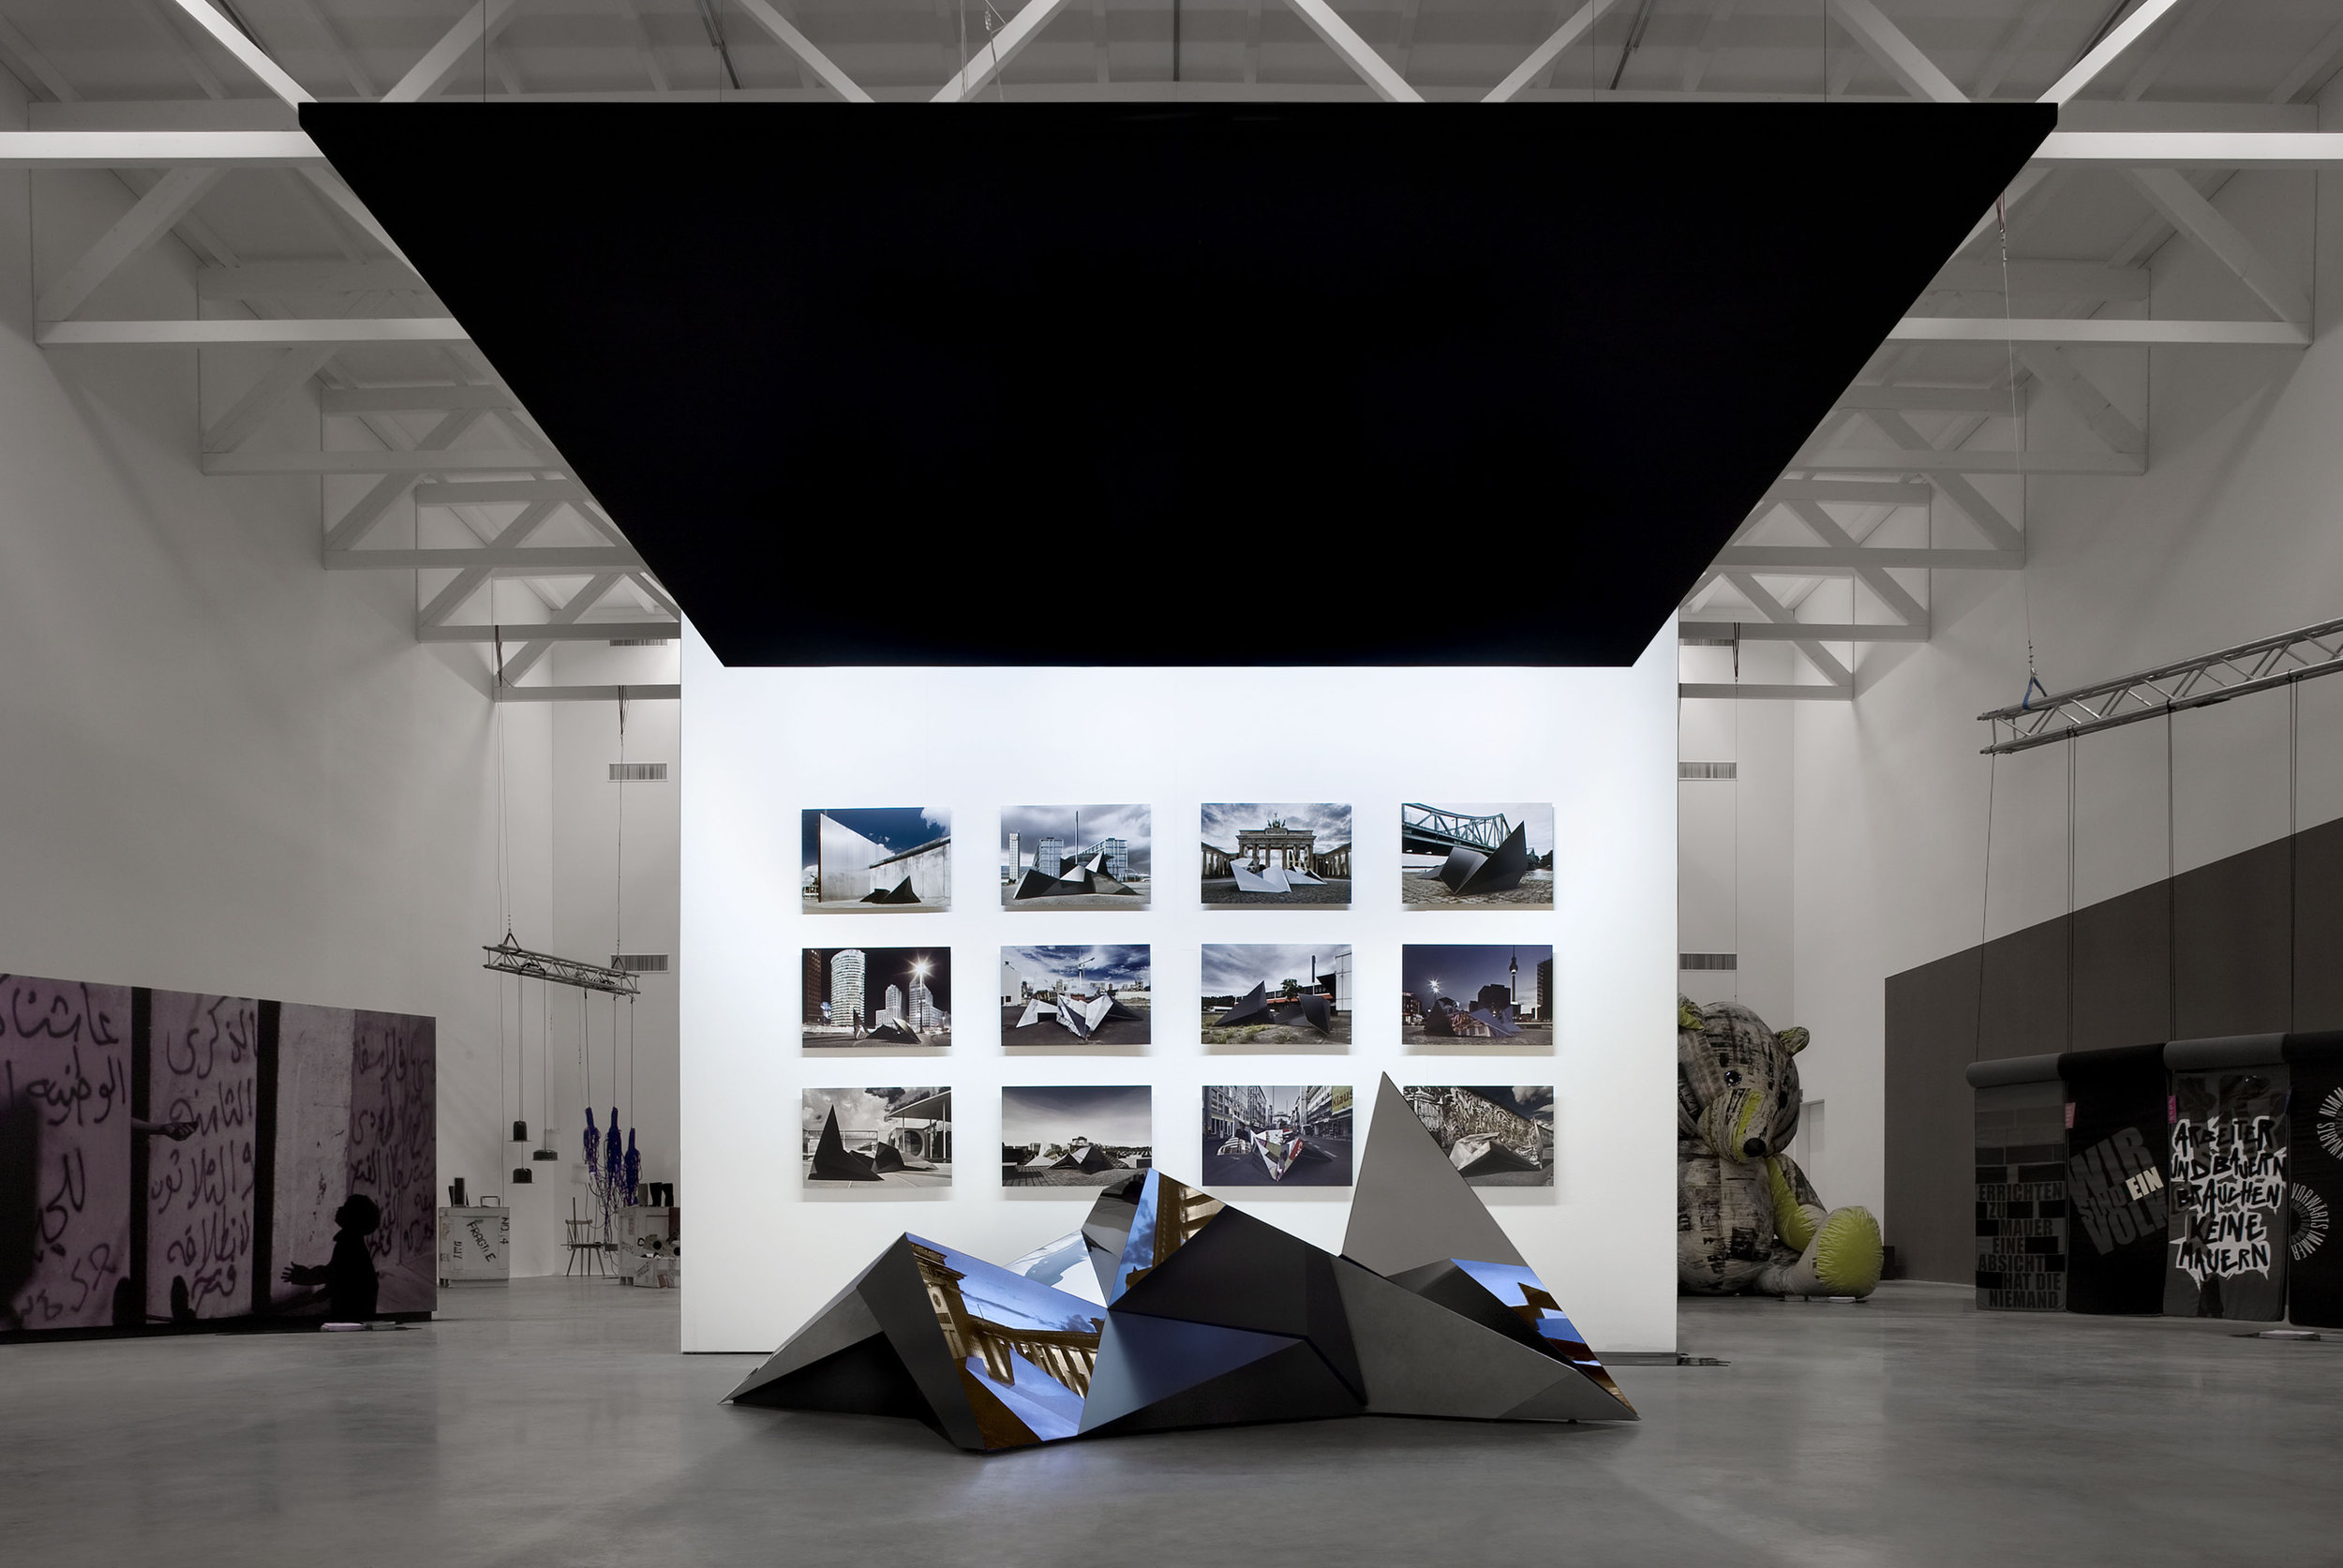 crystal-city-minds_exhibition-design_coordination-berlin07.jpg